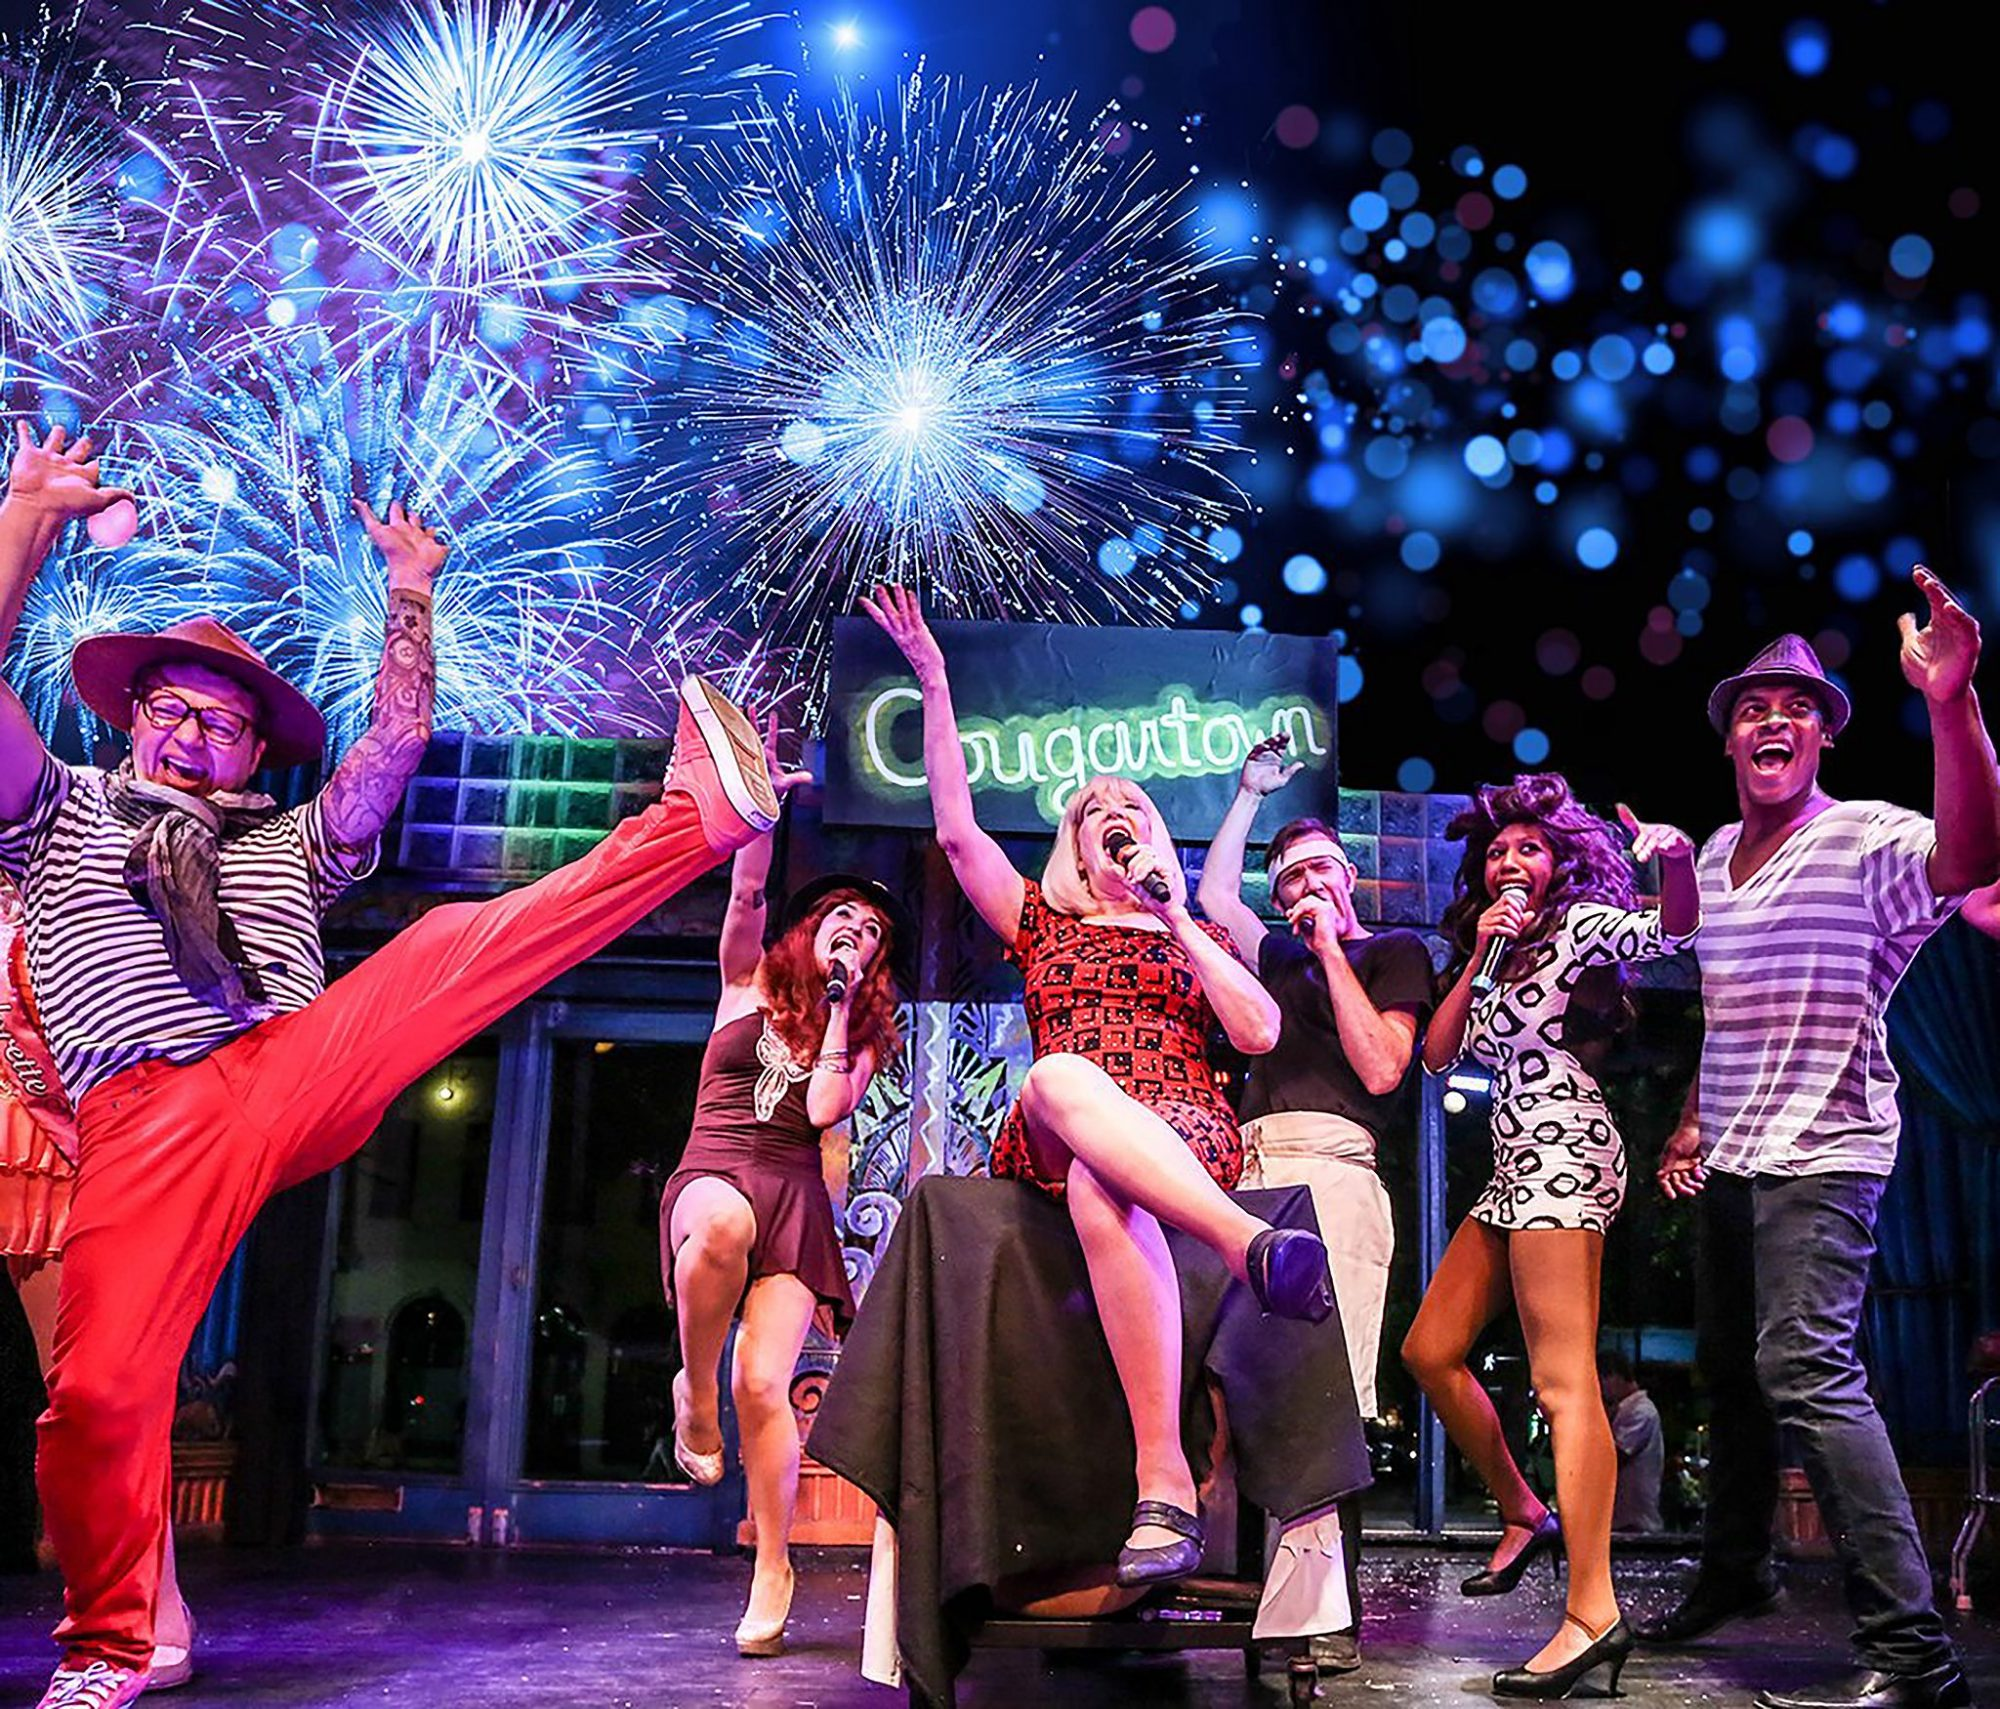 Enjoy local Austin entertainment and flair at Esther's Follies